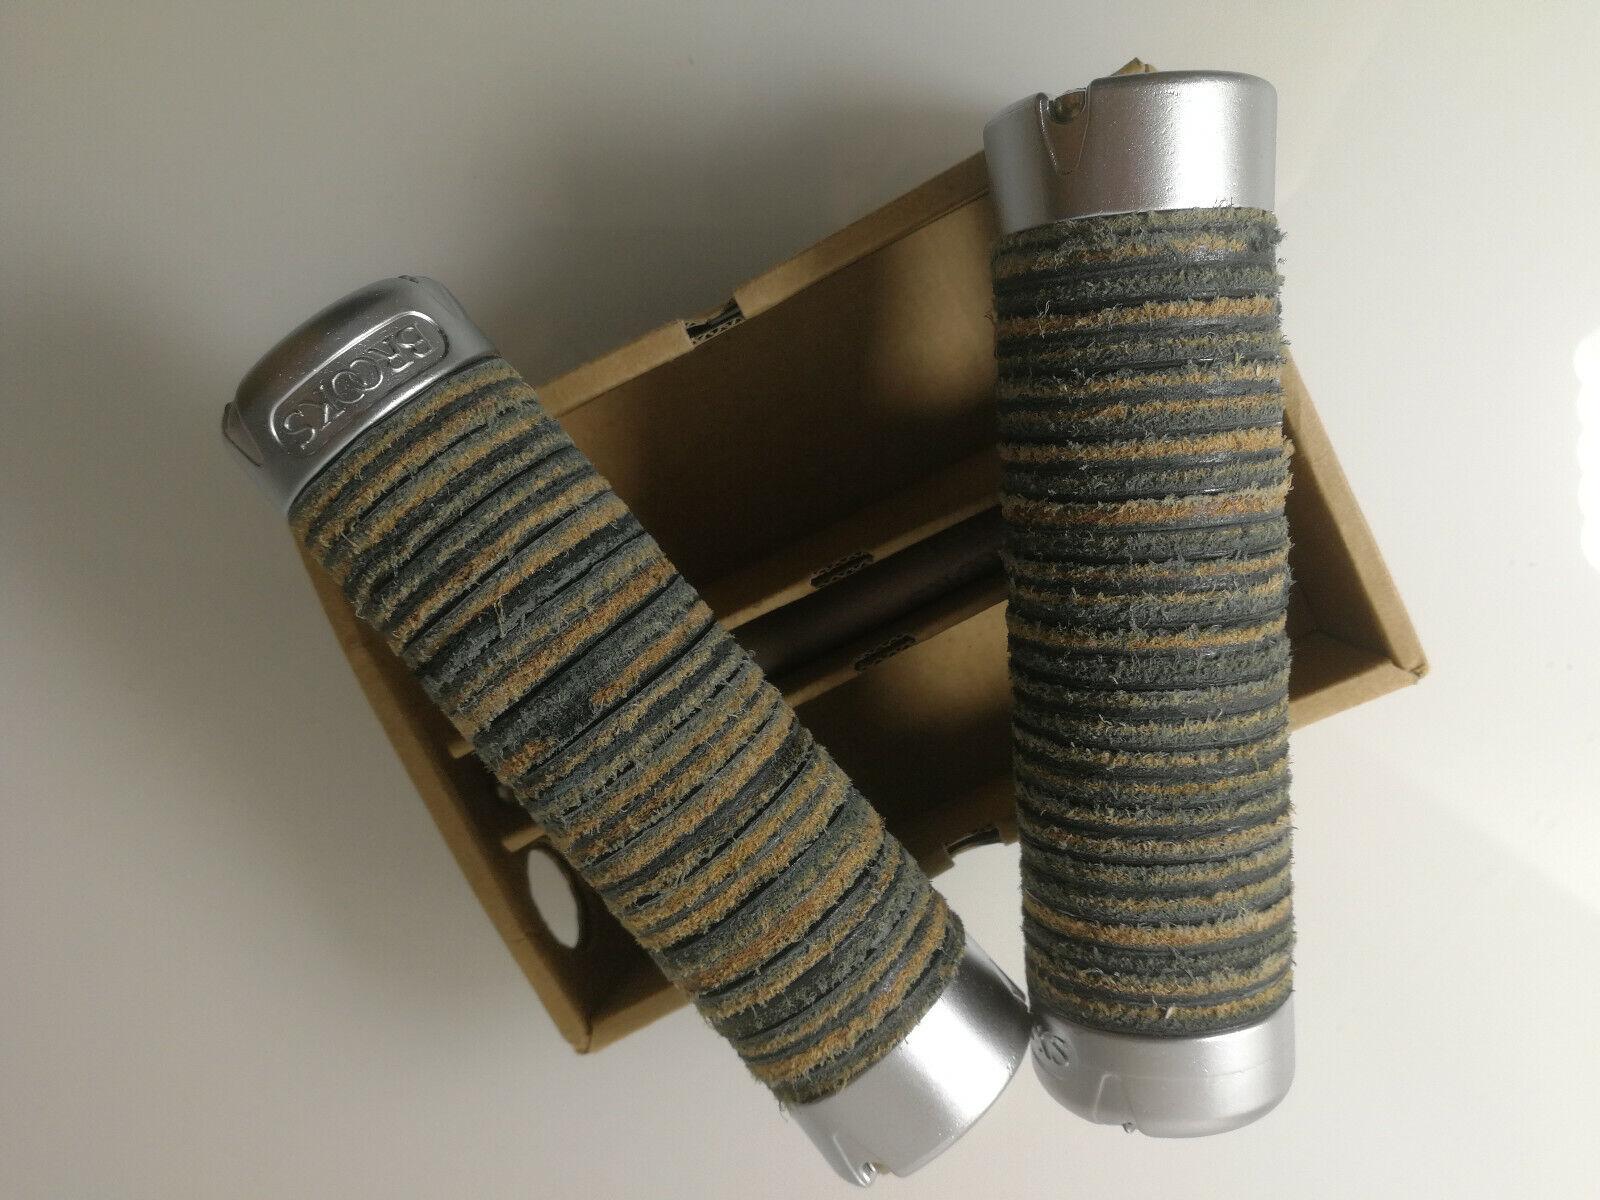 Brooks pinzamientos grips plump Leather 80-130mm mango cuero negro Top confort nuevo